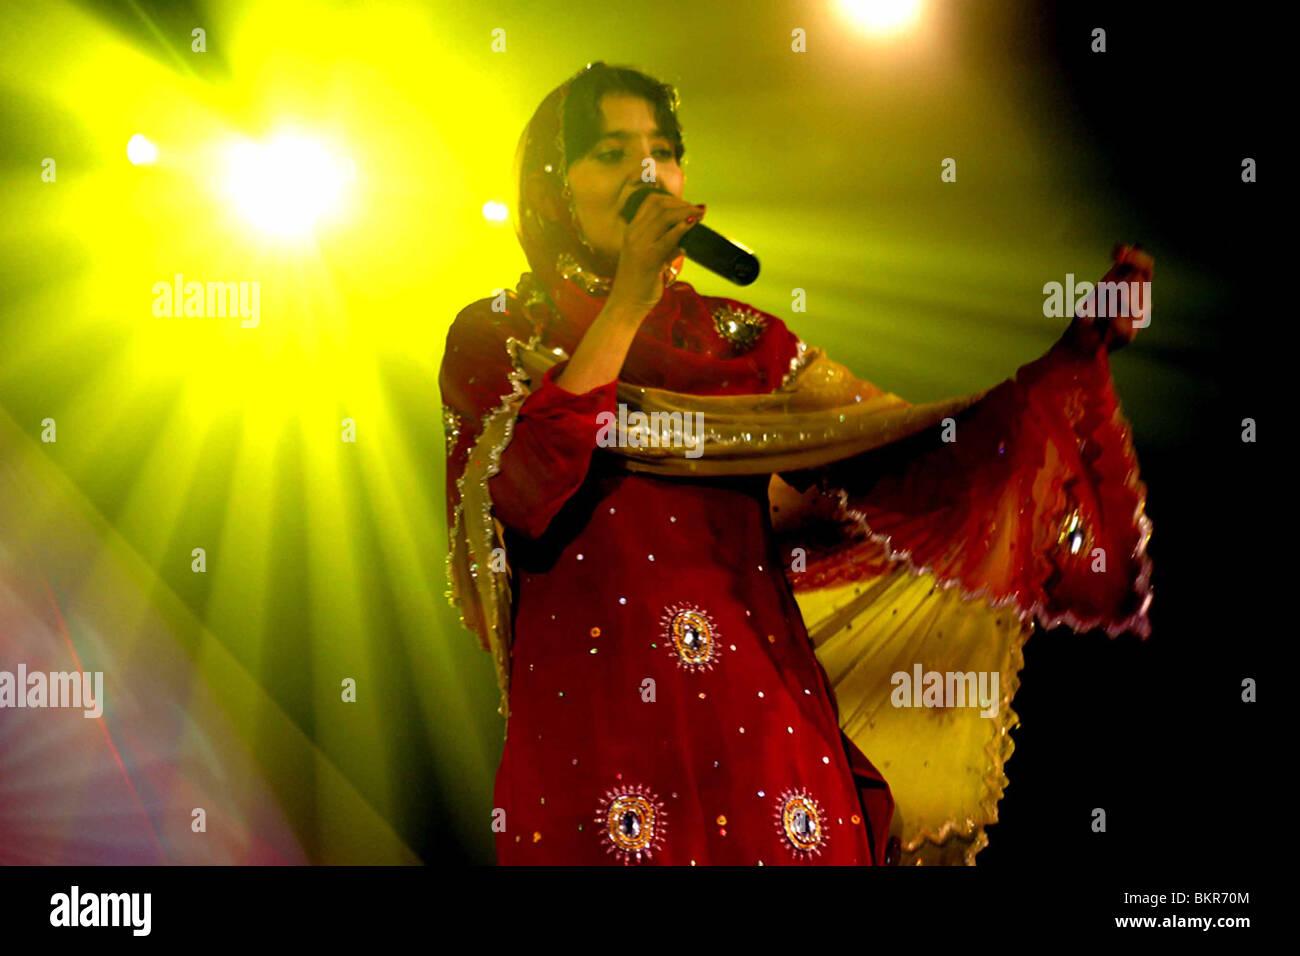 AFGHAN STAR (2009) HAVANA MARKING (DIR) 003 - Stock Image